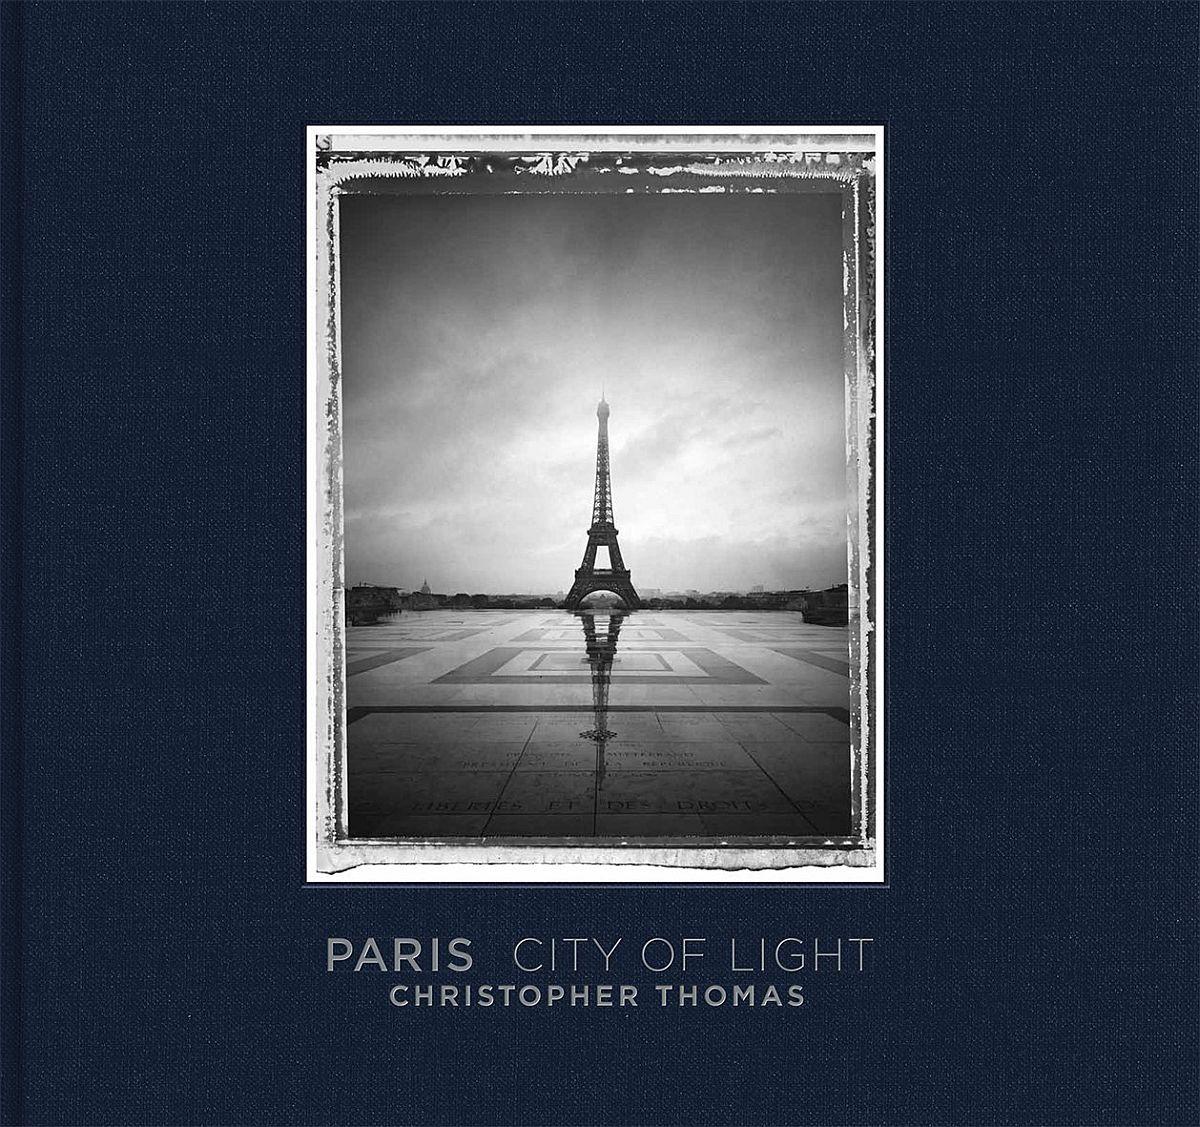 christopher-thomas-paris-city-of-light-00-cover